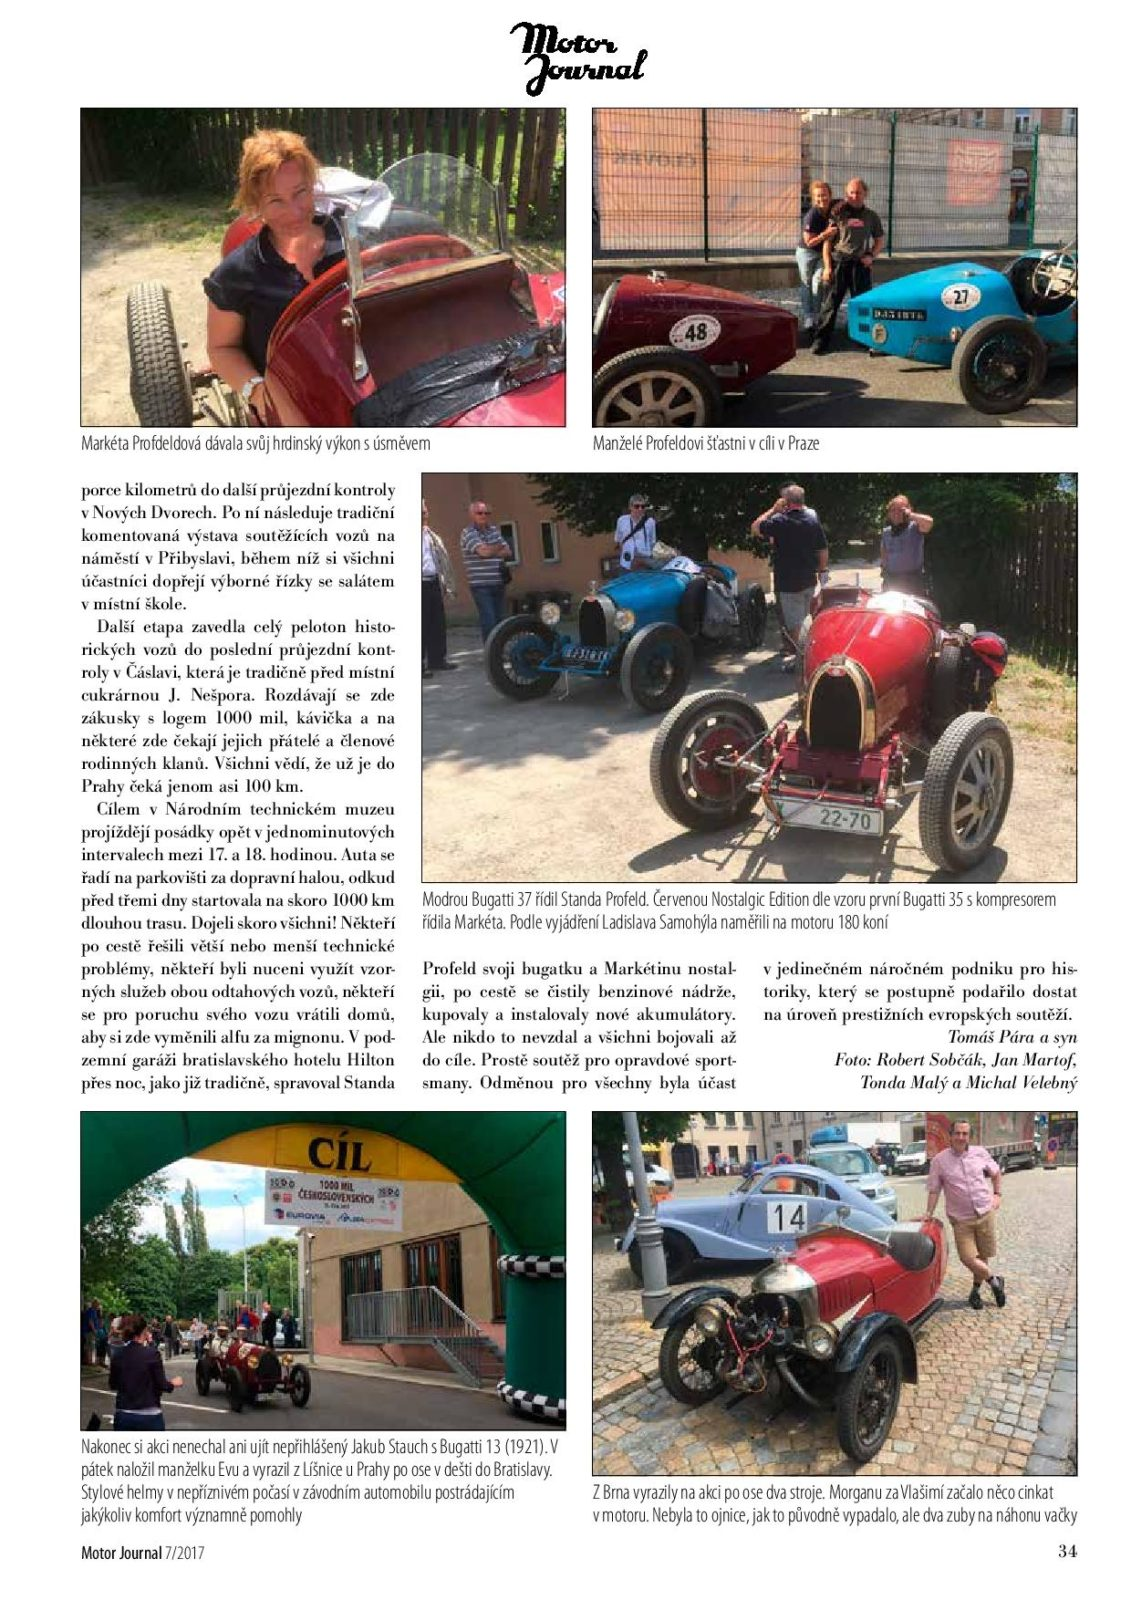 Motojournal 2017